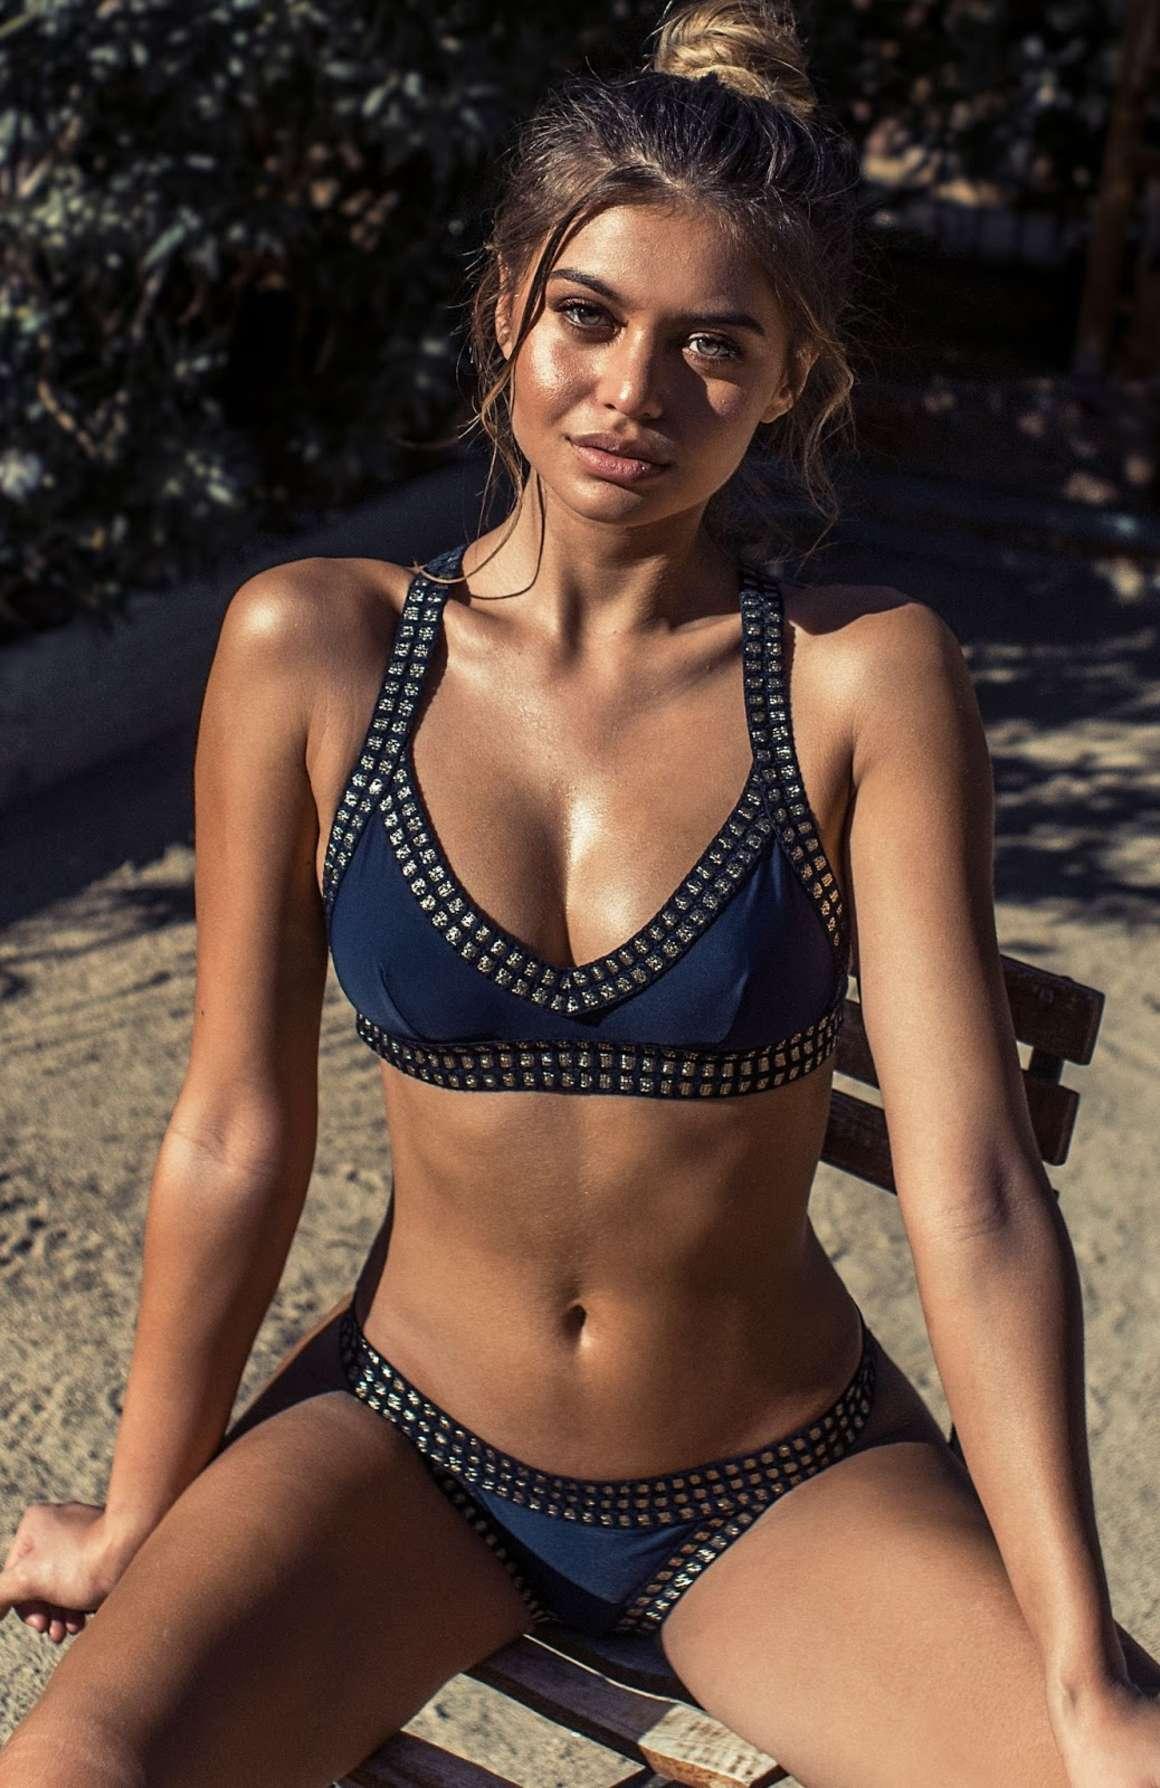 Sofia Jamora 2017 : Sofia Jamora Hot in Bikini: Instagram -06